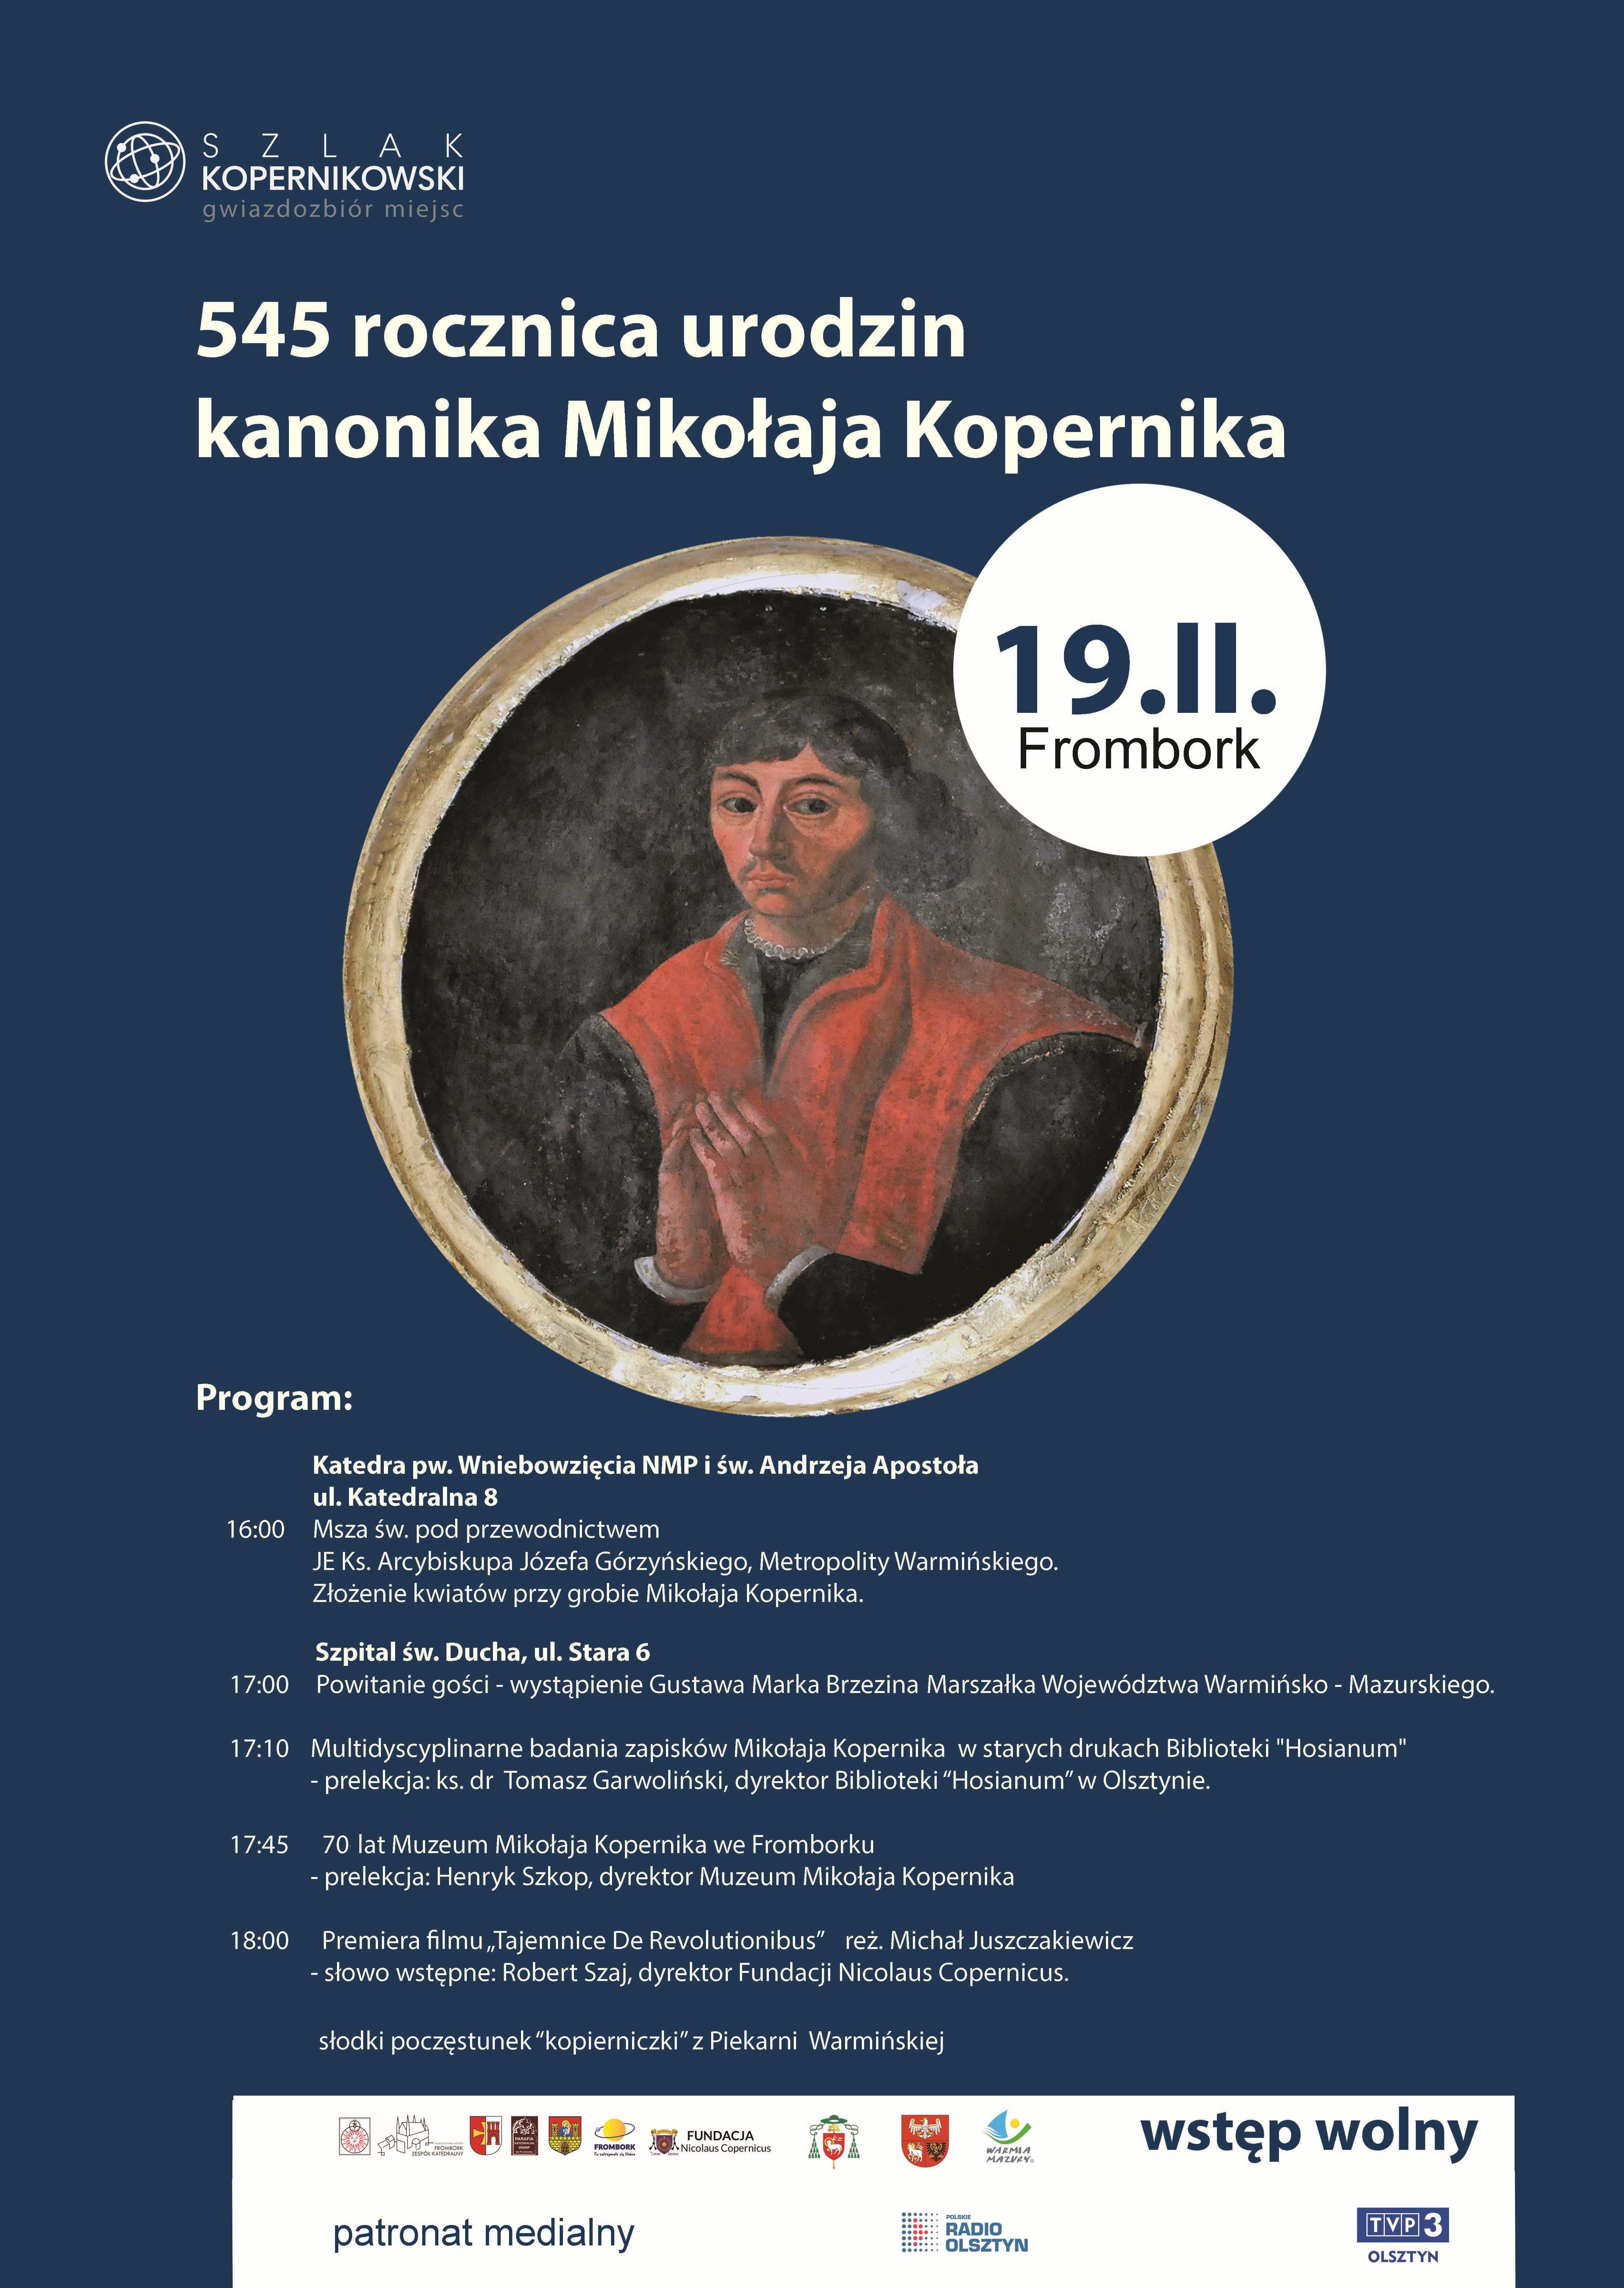 http://m.wm.pl/2018/02/orig/0000099193-plakat-urodziny-kopernika-media-446745.jpg